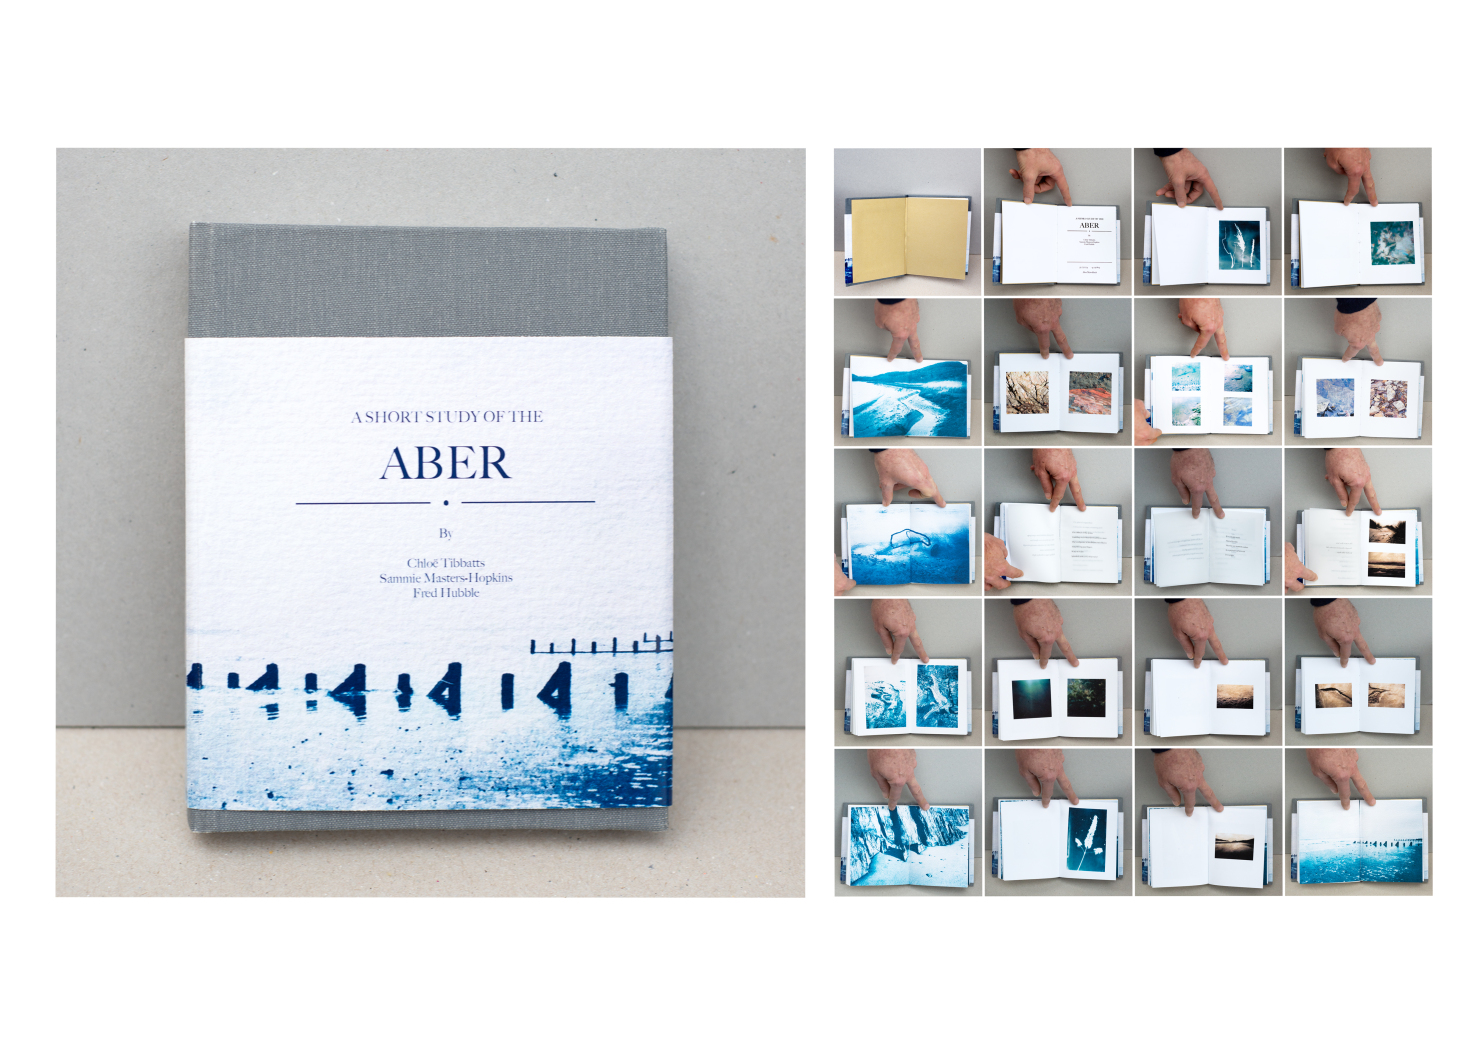 The Aber1.jpg